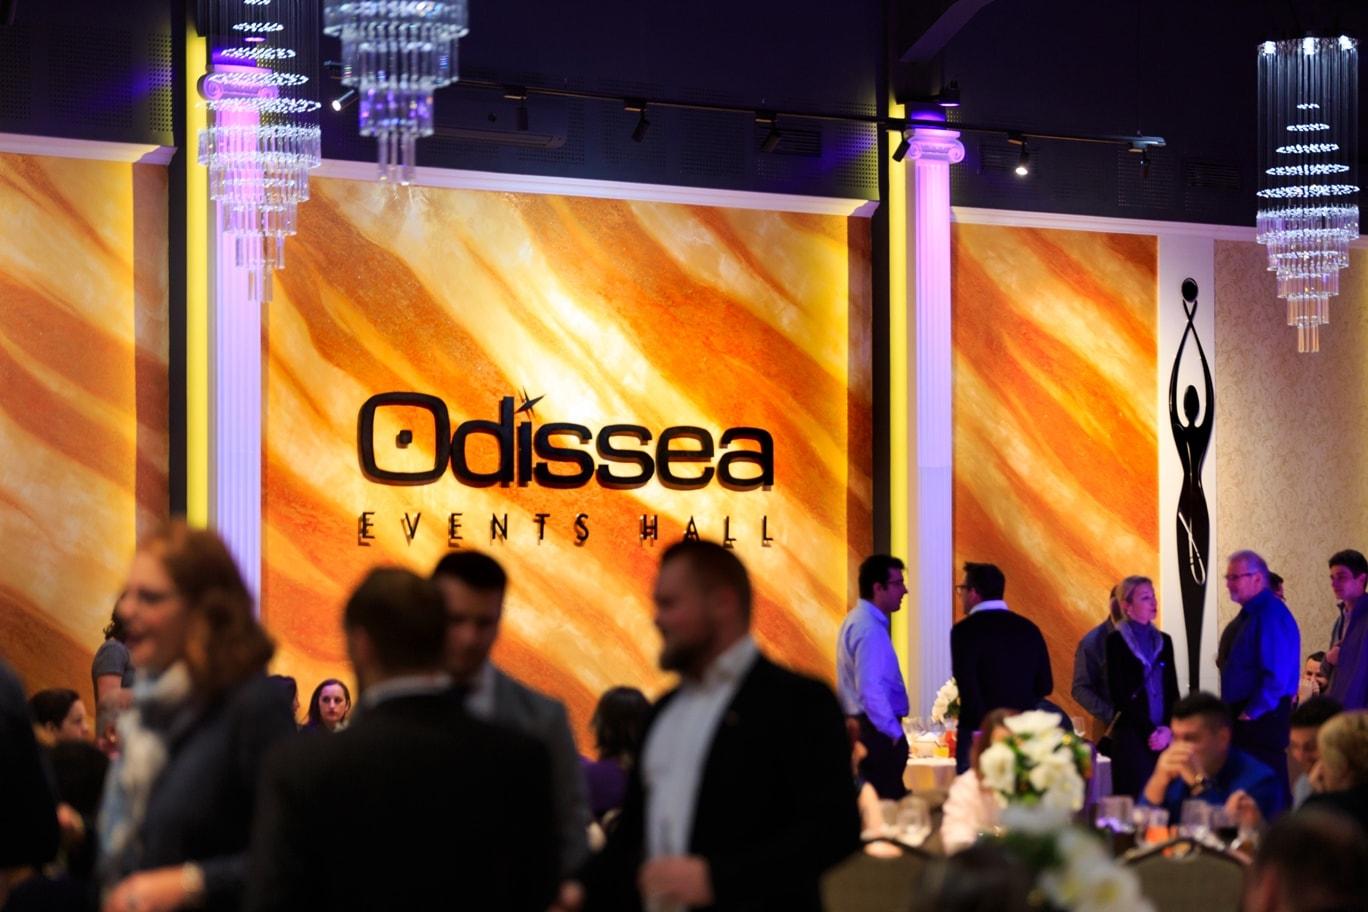 odissea_events_hall_sibiu_4